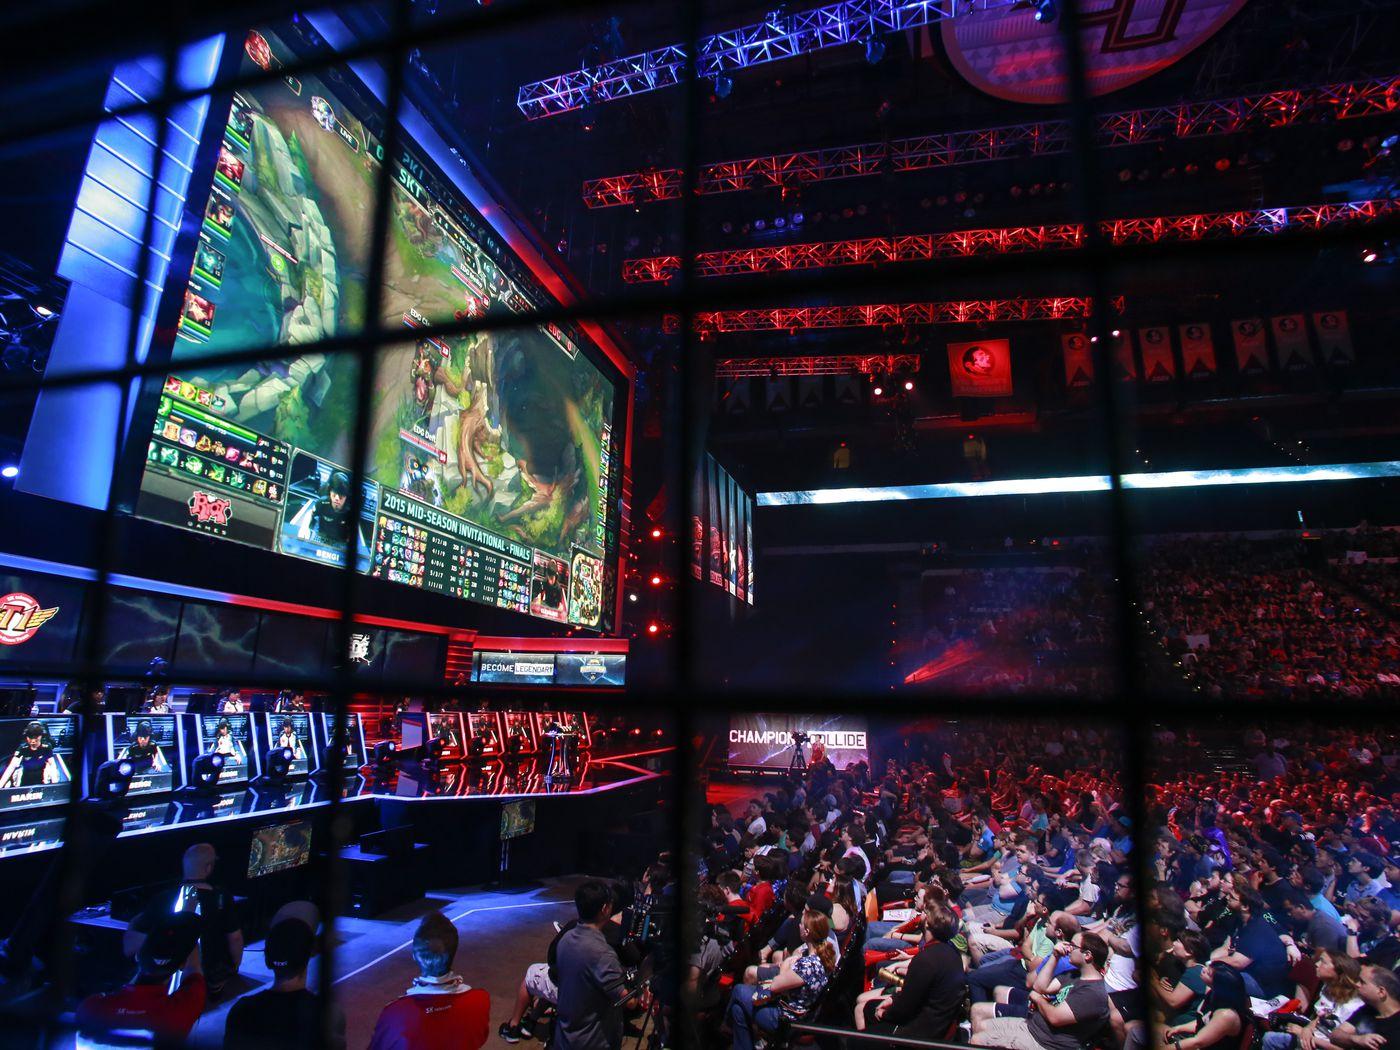 League of Legends casters boycotting Shanghai event over